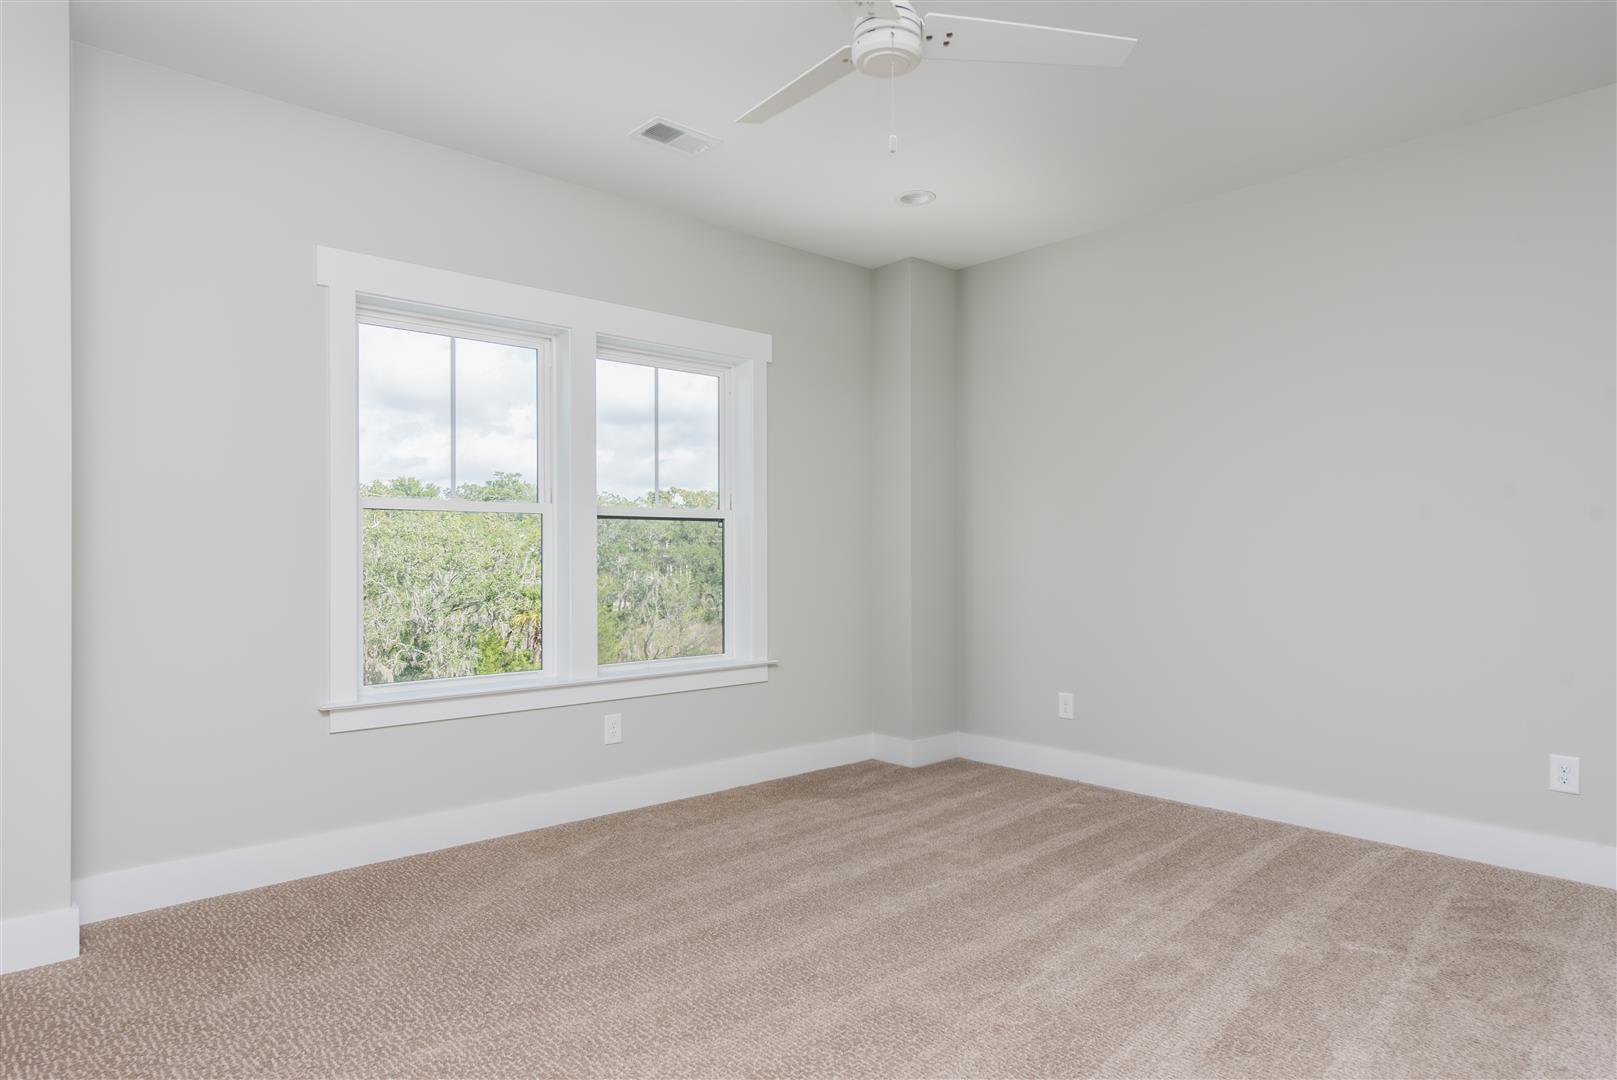 Scanlonville Homes For Sale - 160 5th, Mount Pleasant, SC - 18